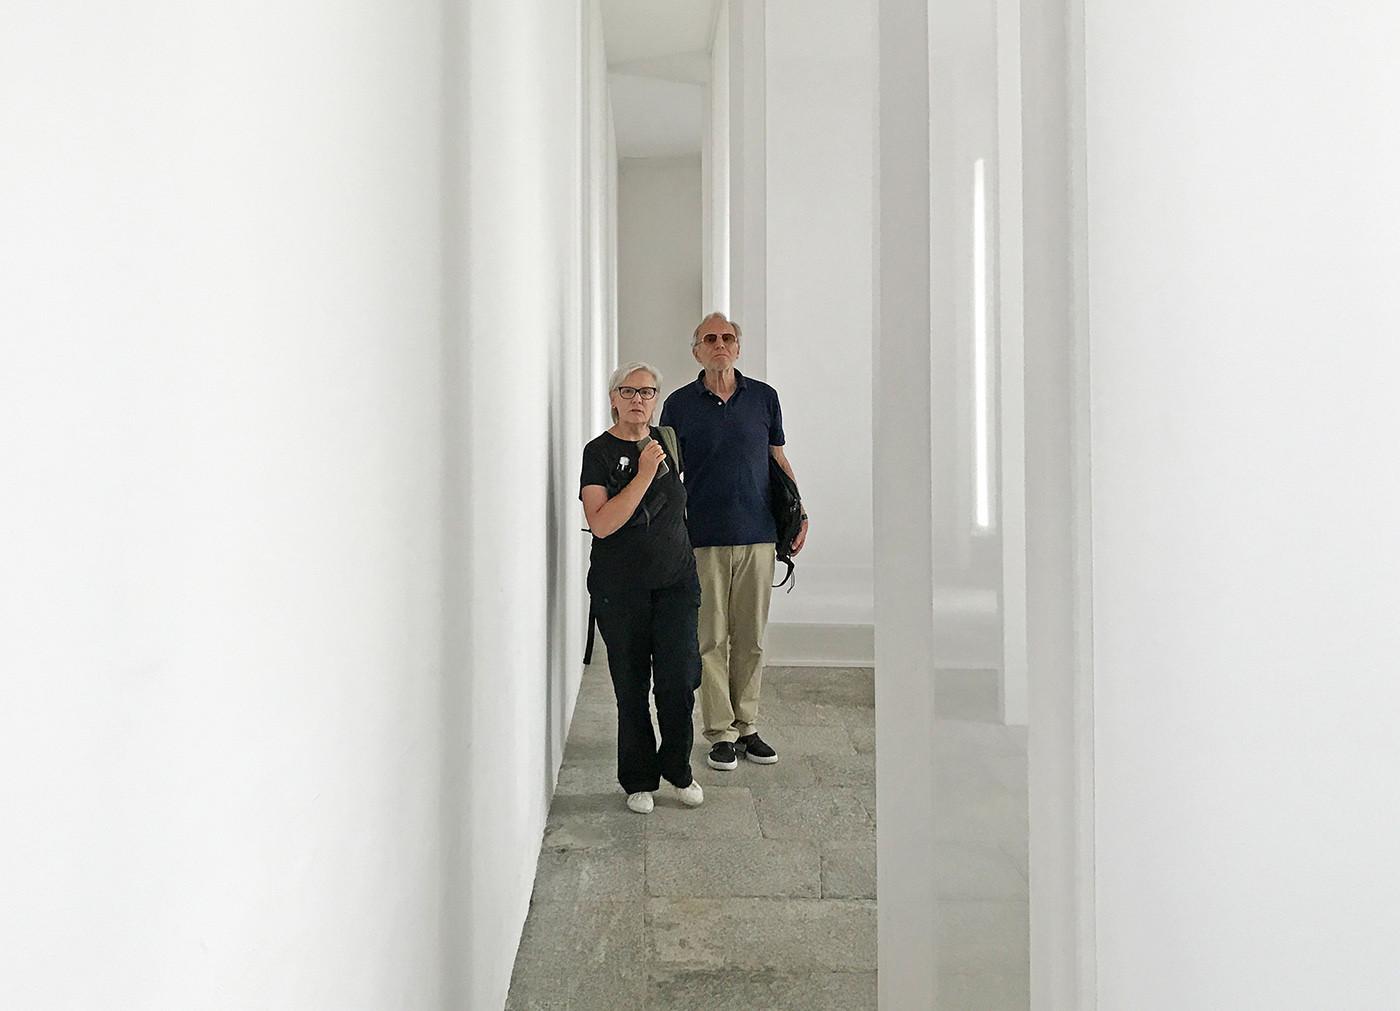 Aisthesis by Robert Irwin, Villa Panza, Varese